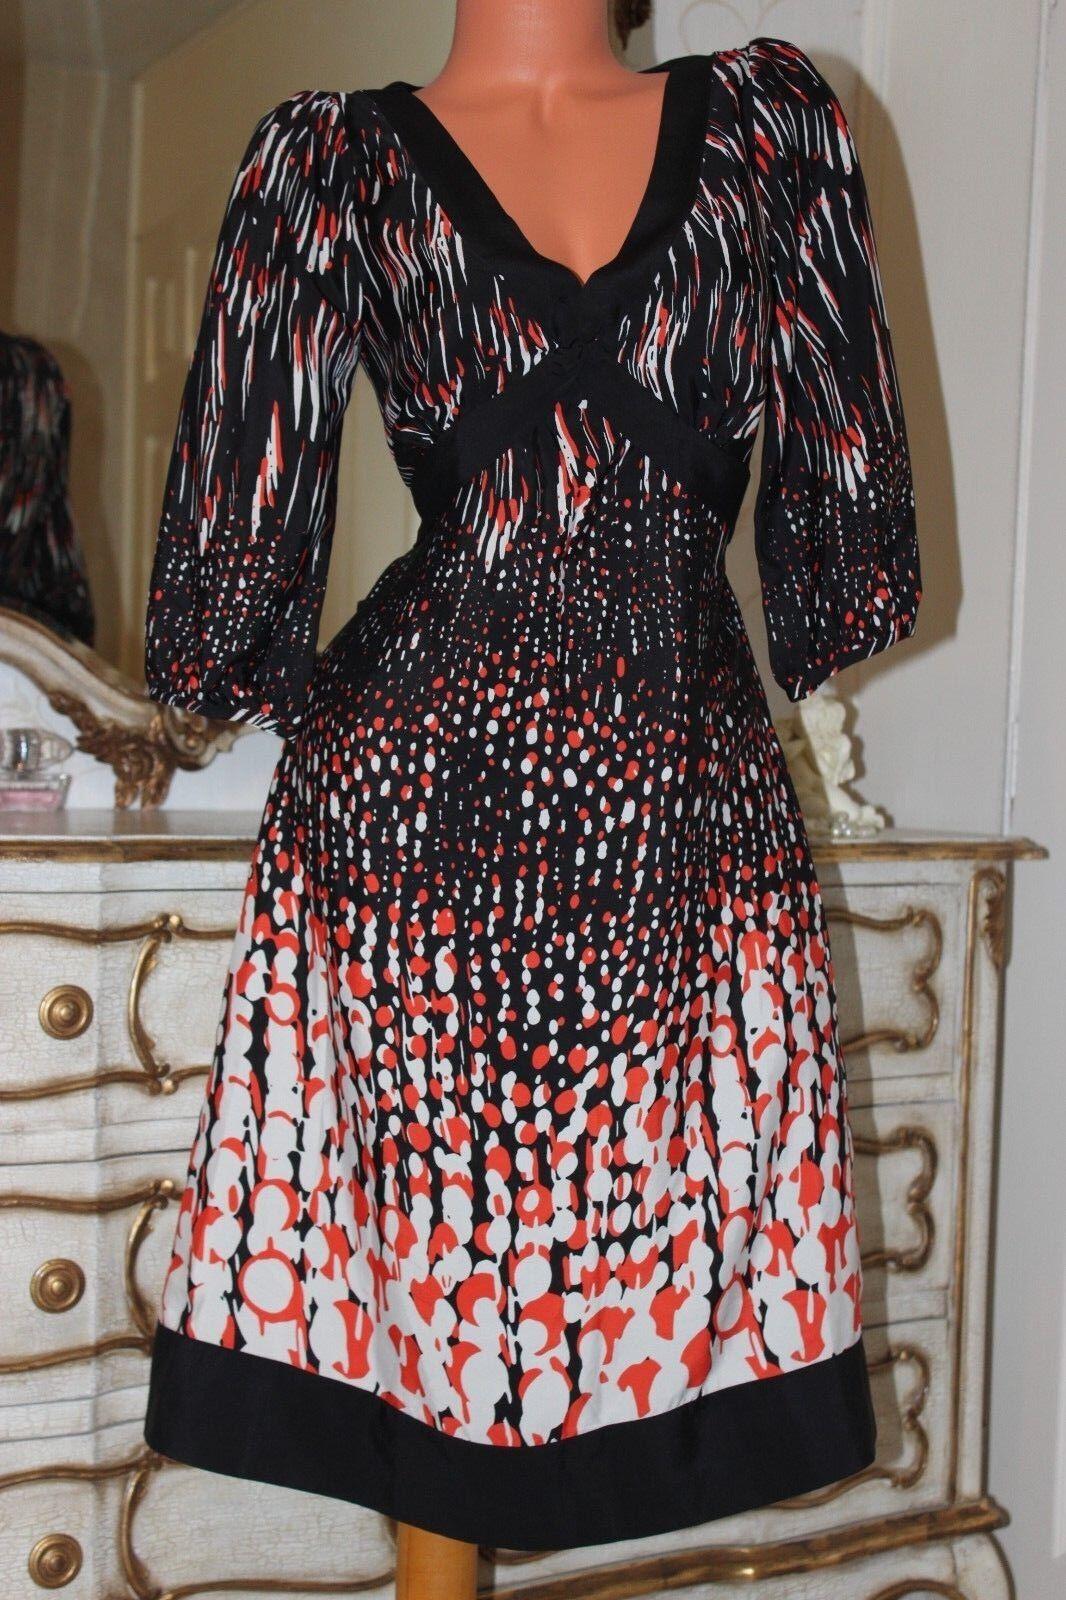 (Ref 4) MONSOON  schwarz Mix Patterned Ladies A - Lined  Dress Größe 10